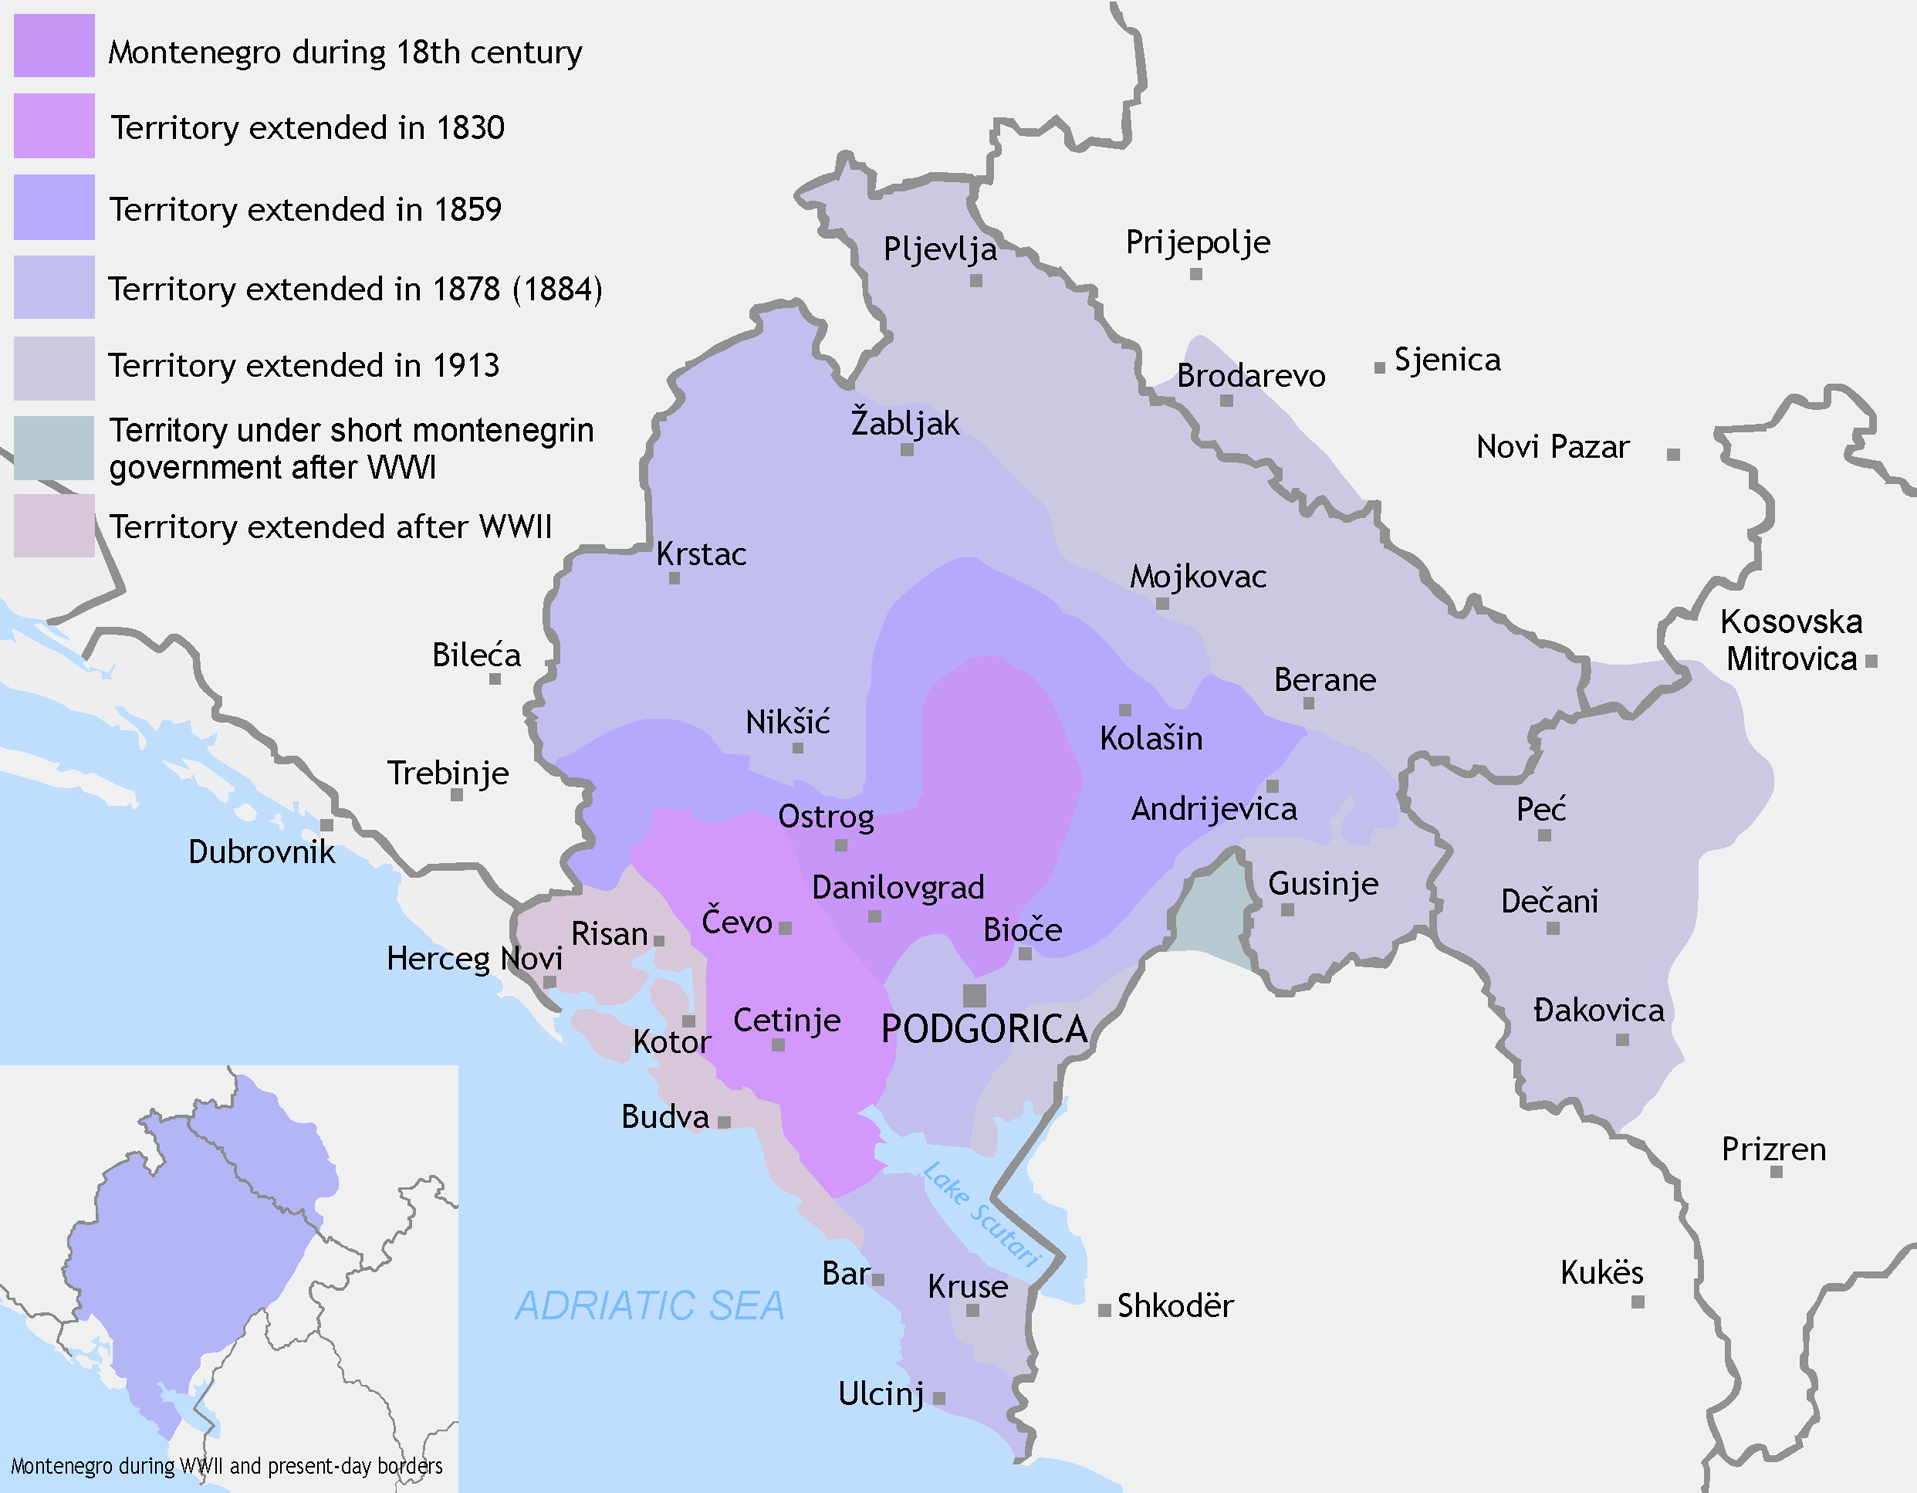 Bar Montenegro Karte.File Montenegro Territory Expanded 1830 1944 Png